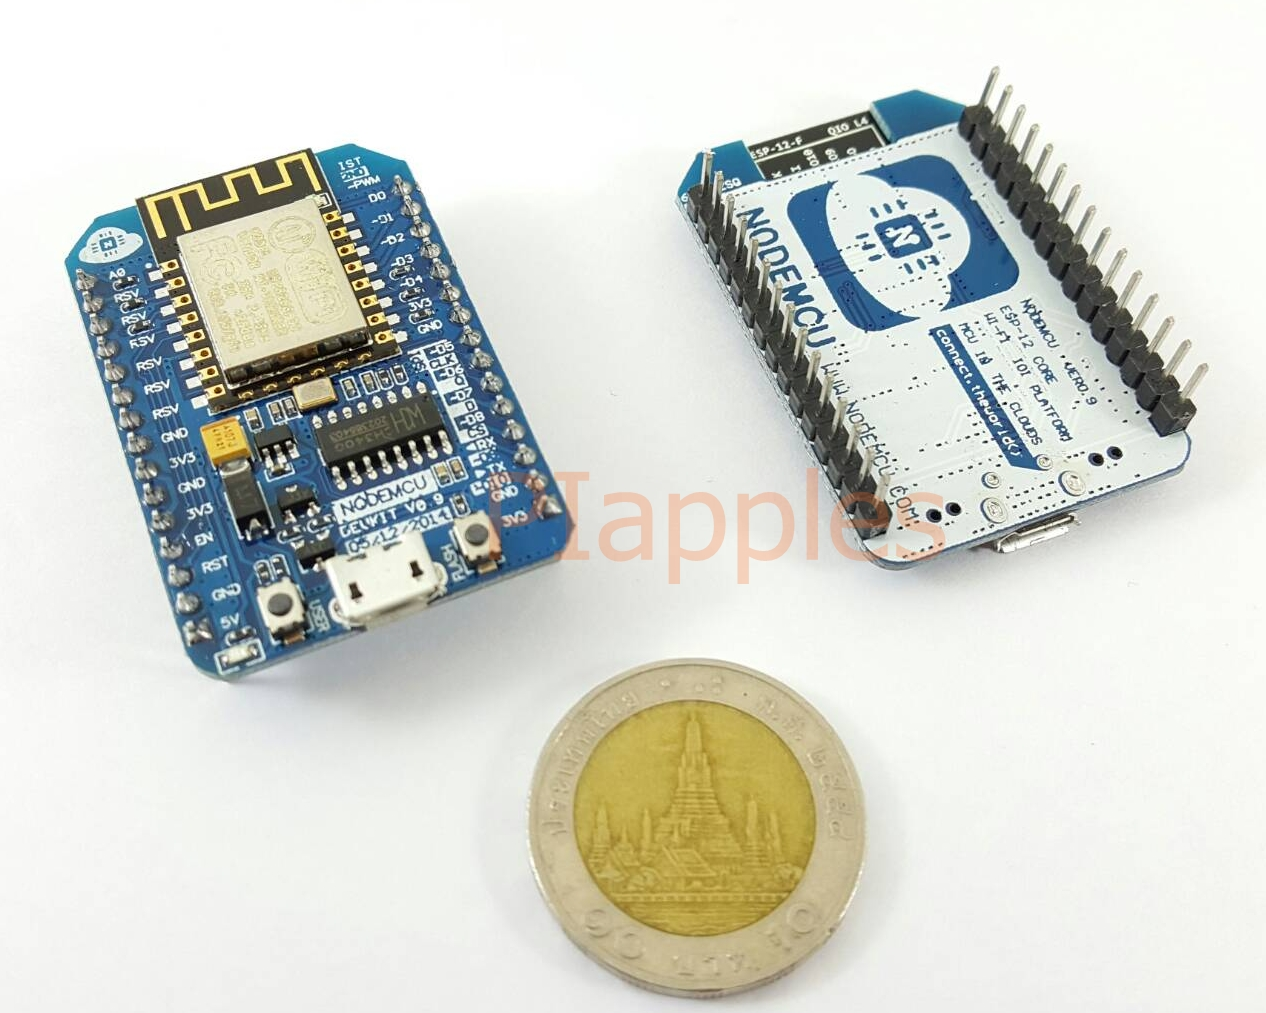 NodeMCUราคาถูก ESP-12 WIFI Networking Development Board (ESP8266) ราคาถูก IOT